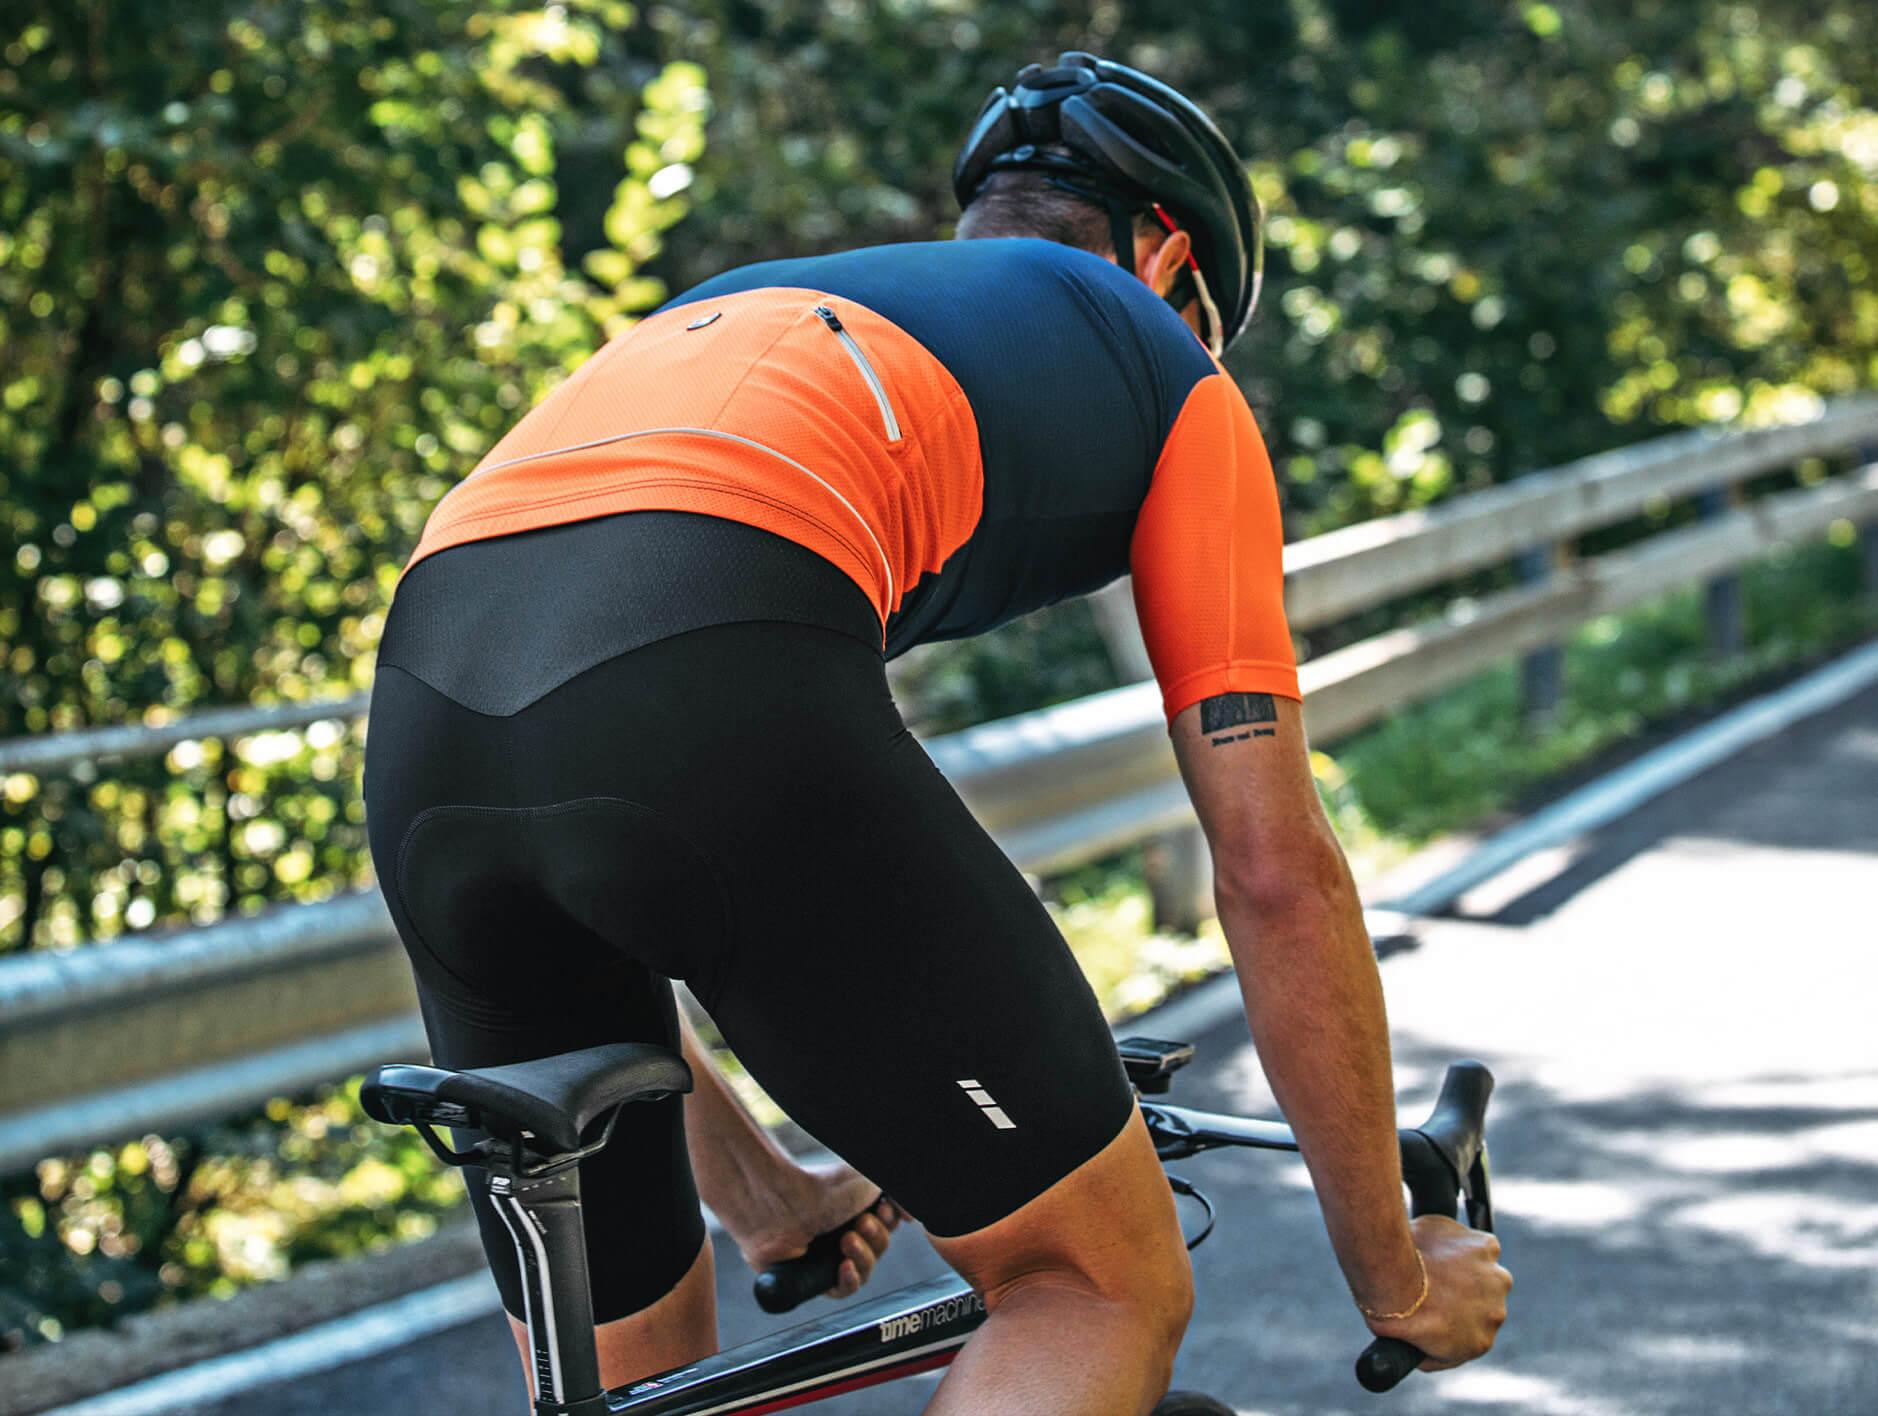 giordana-cycling-bib-short-guide-lungo-large-1